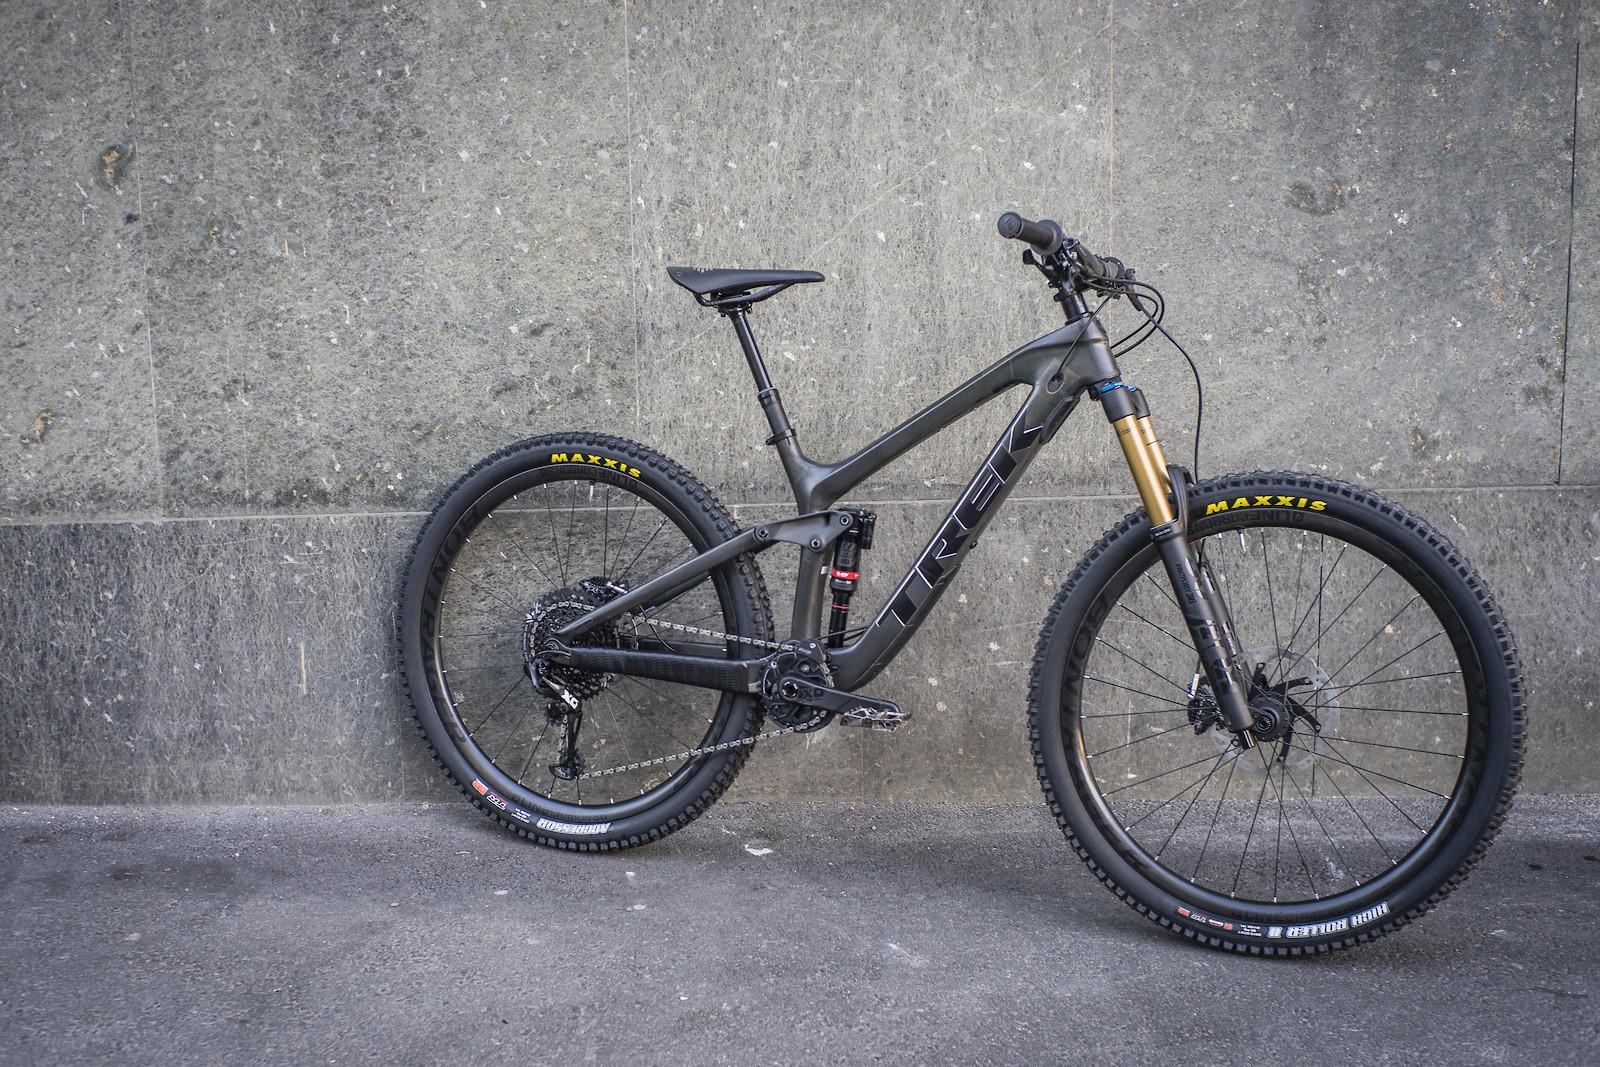 Trek Slash 9.9 - 2019 Vital Bike of the Day Collection - Mountain Biking Pictures - Vital MTB